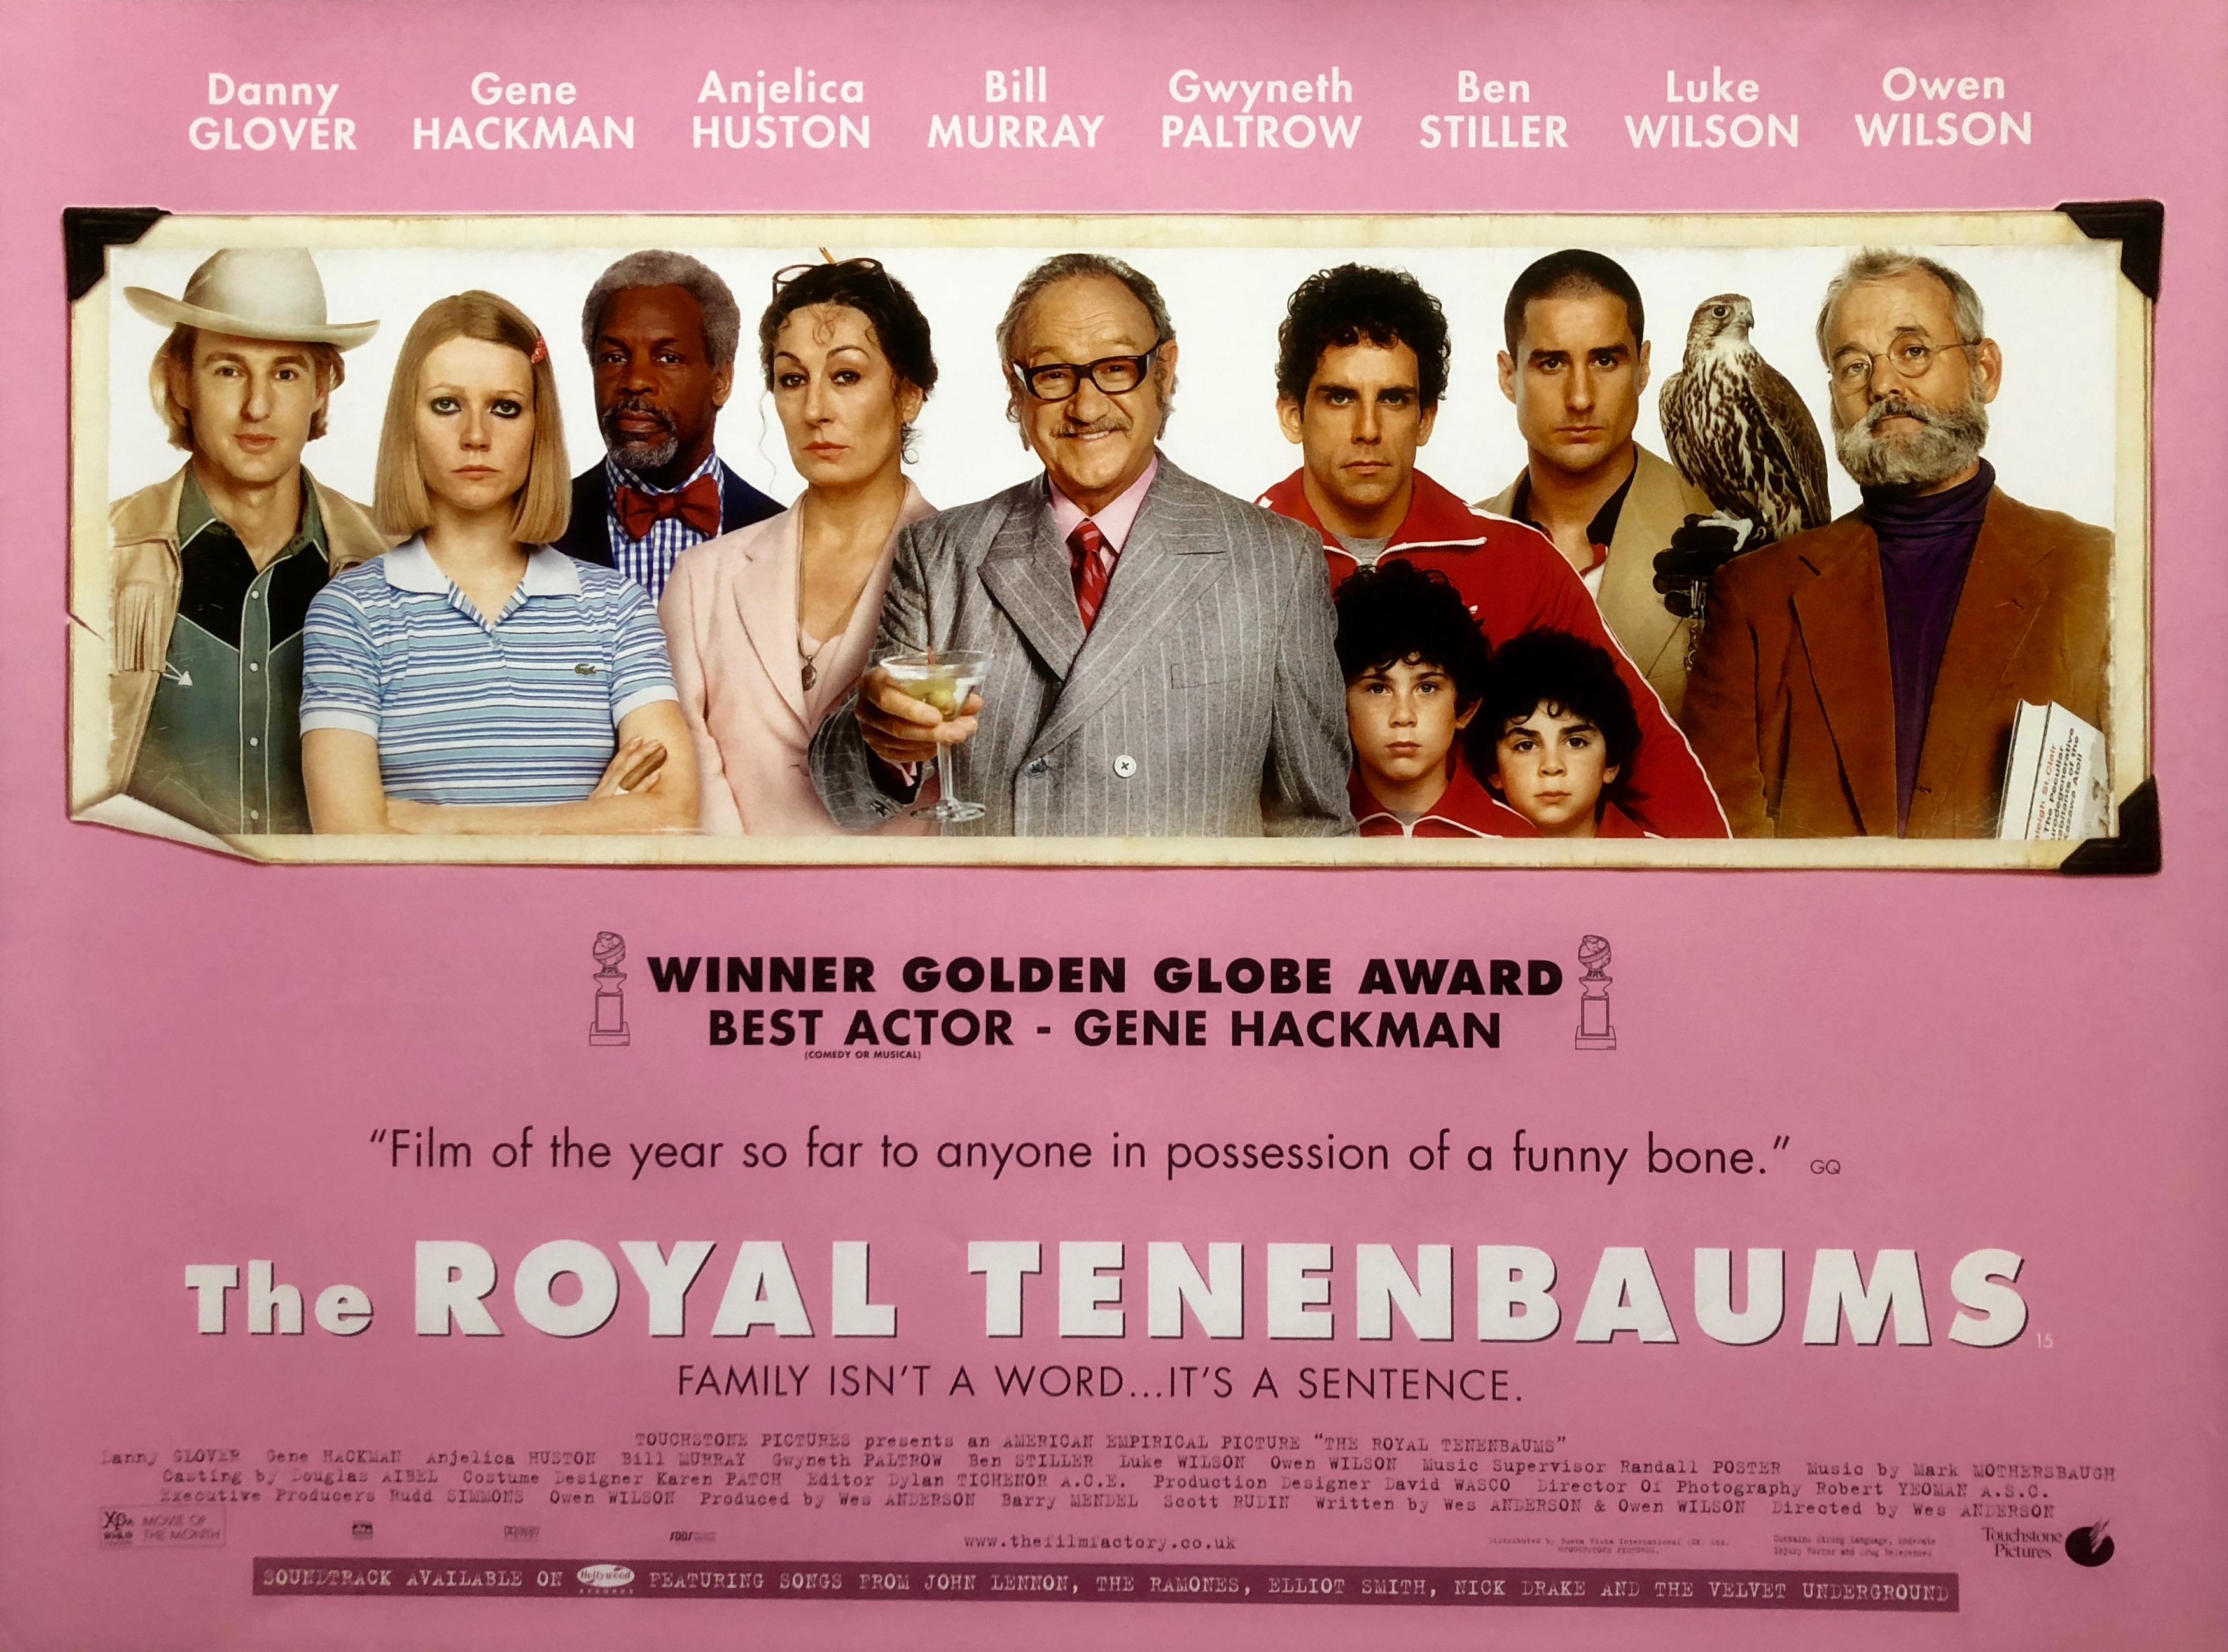 The Royal Tenenbaums Movie Poster - Original Poster